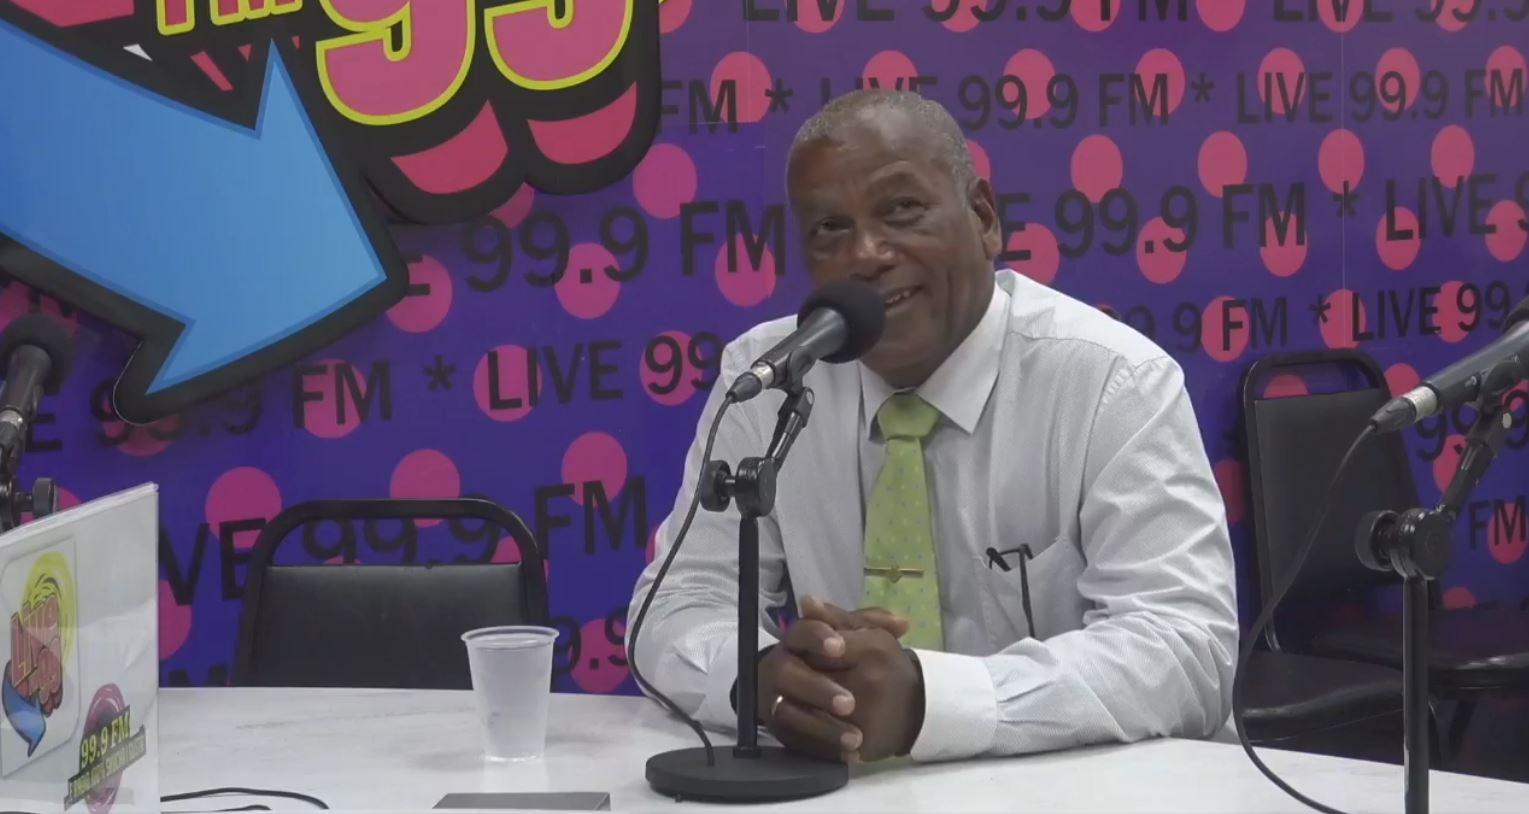 OTRO SIMAN LO DUNA INFORMASHON TOKANTE INVESTIGASHON ROTÒNDE KAYA AMSTERDAM